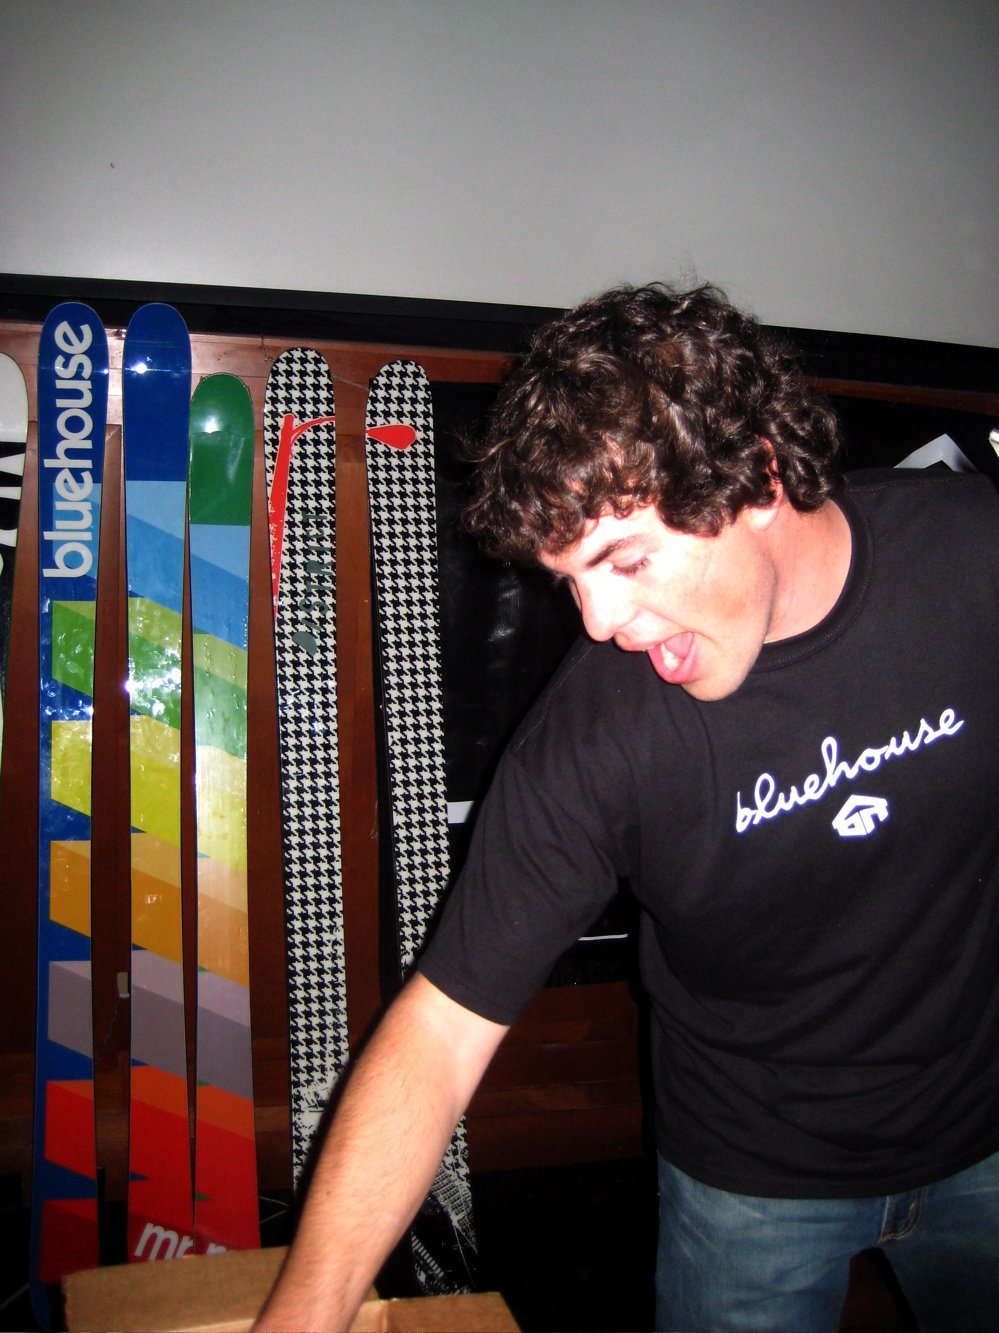 Blue House skis